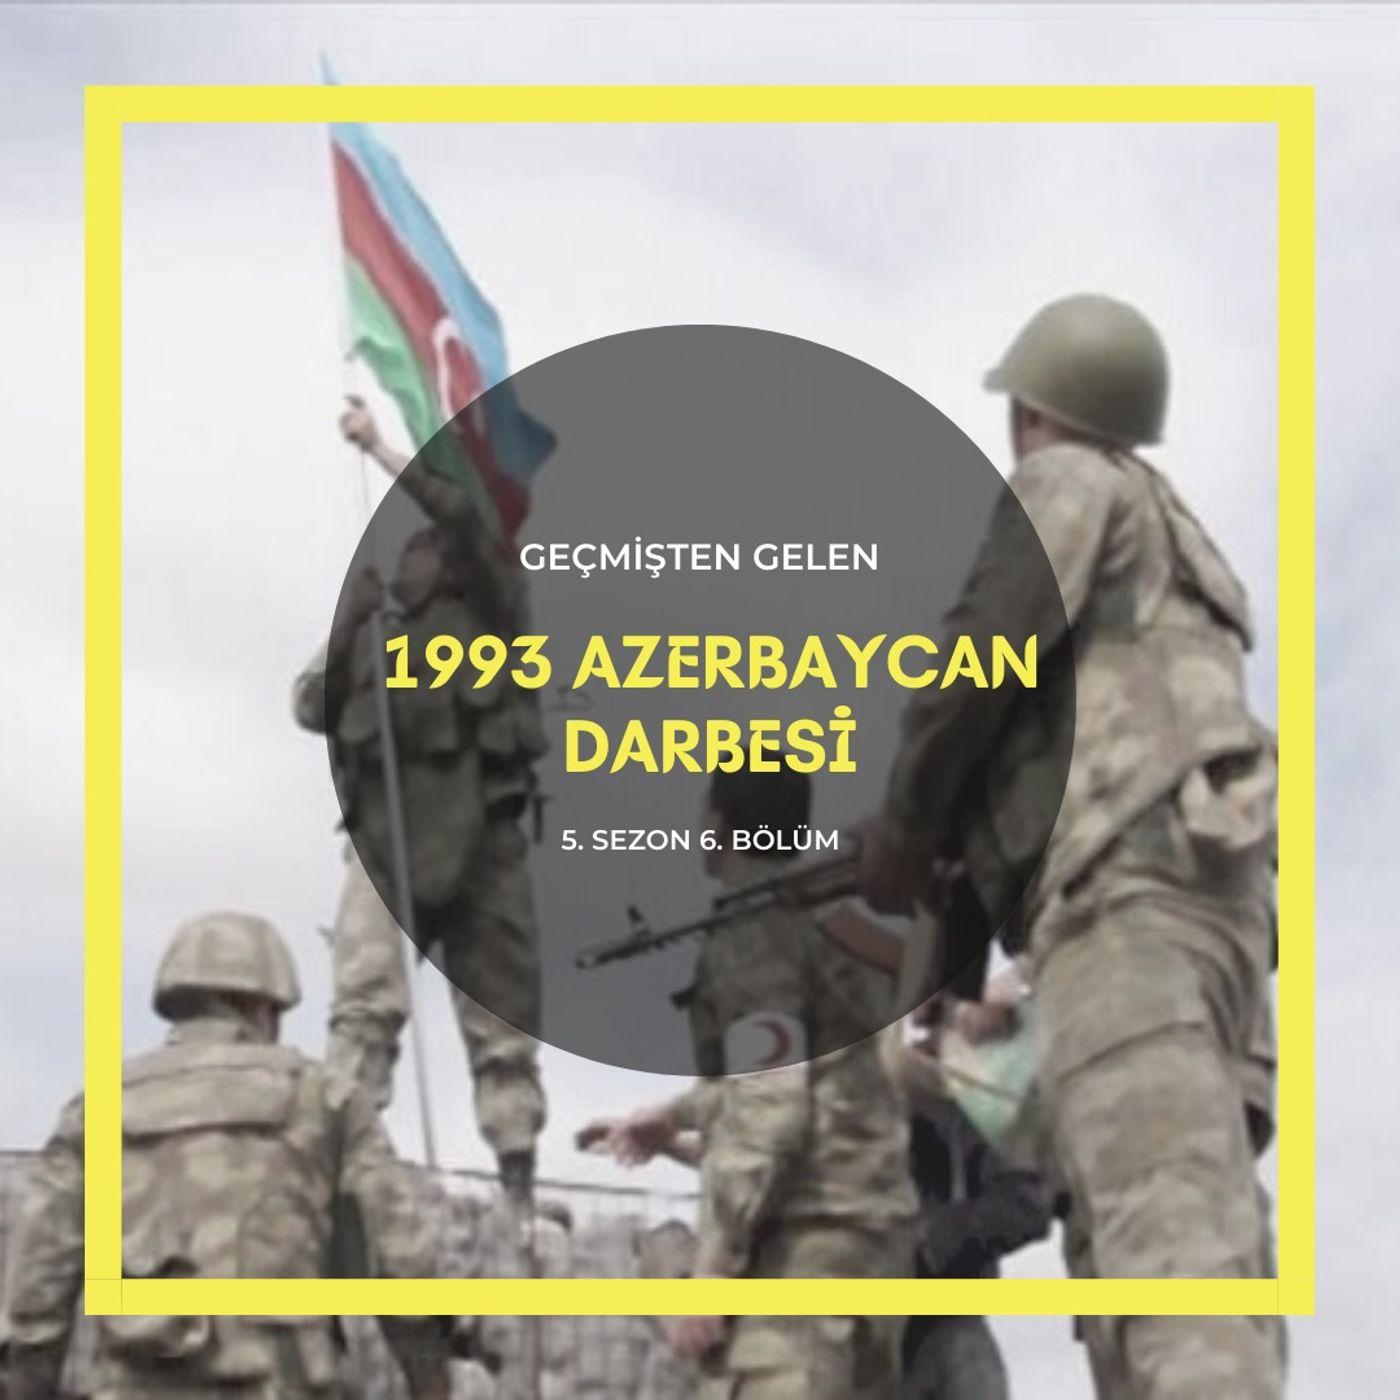 ASKERİ DARBELER .06 - 1993 Azerbaycan Darbesi